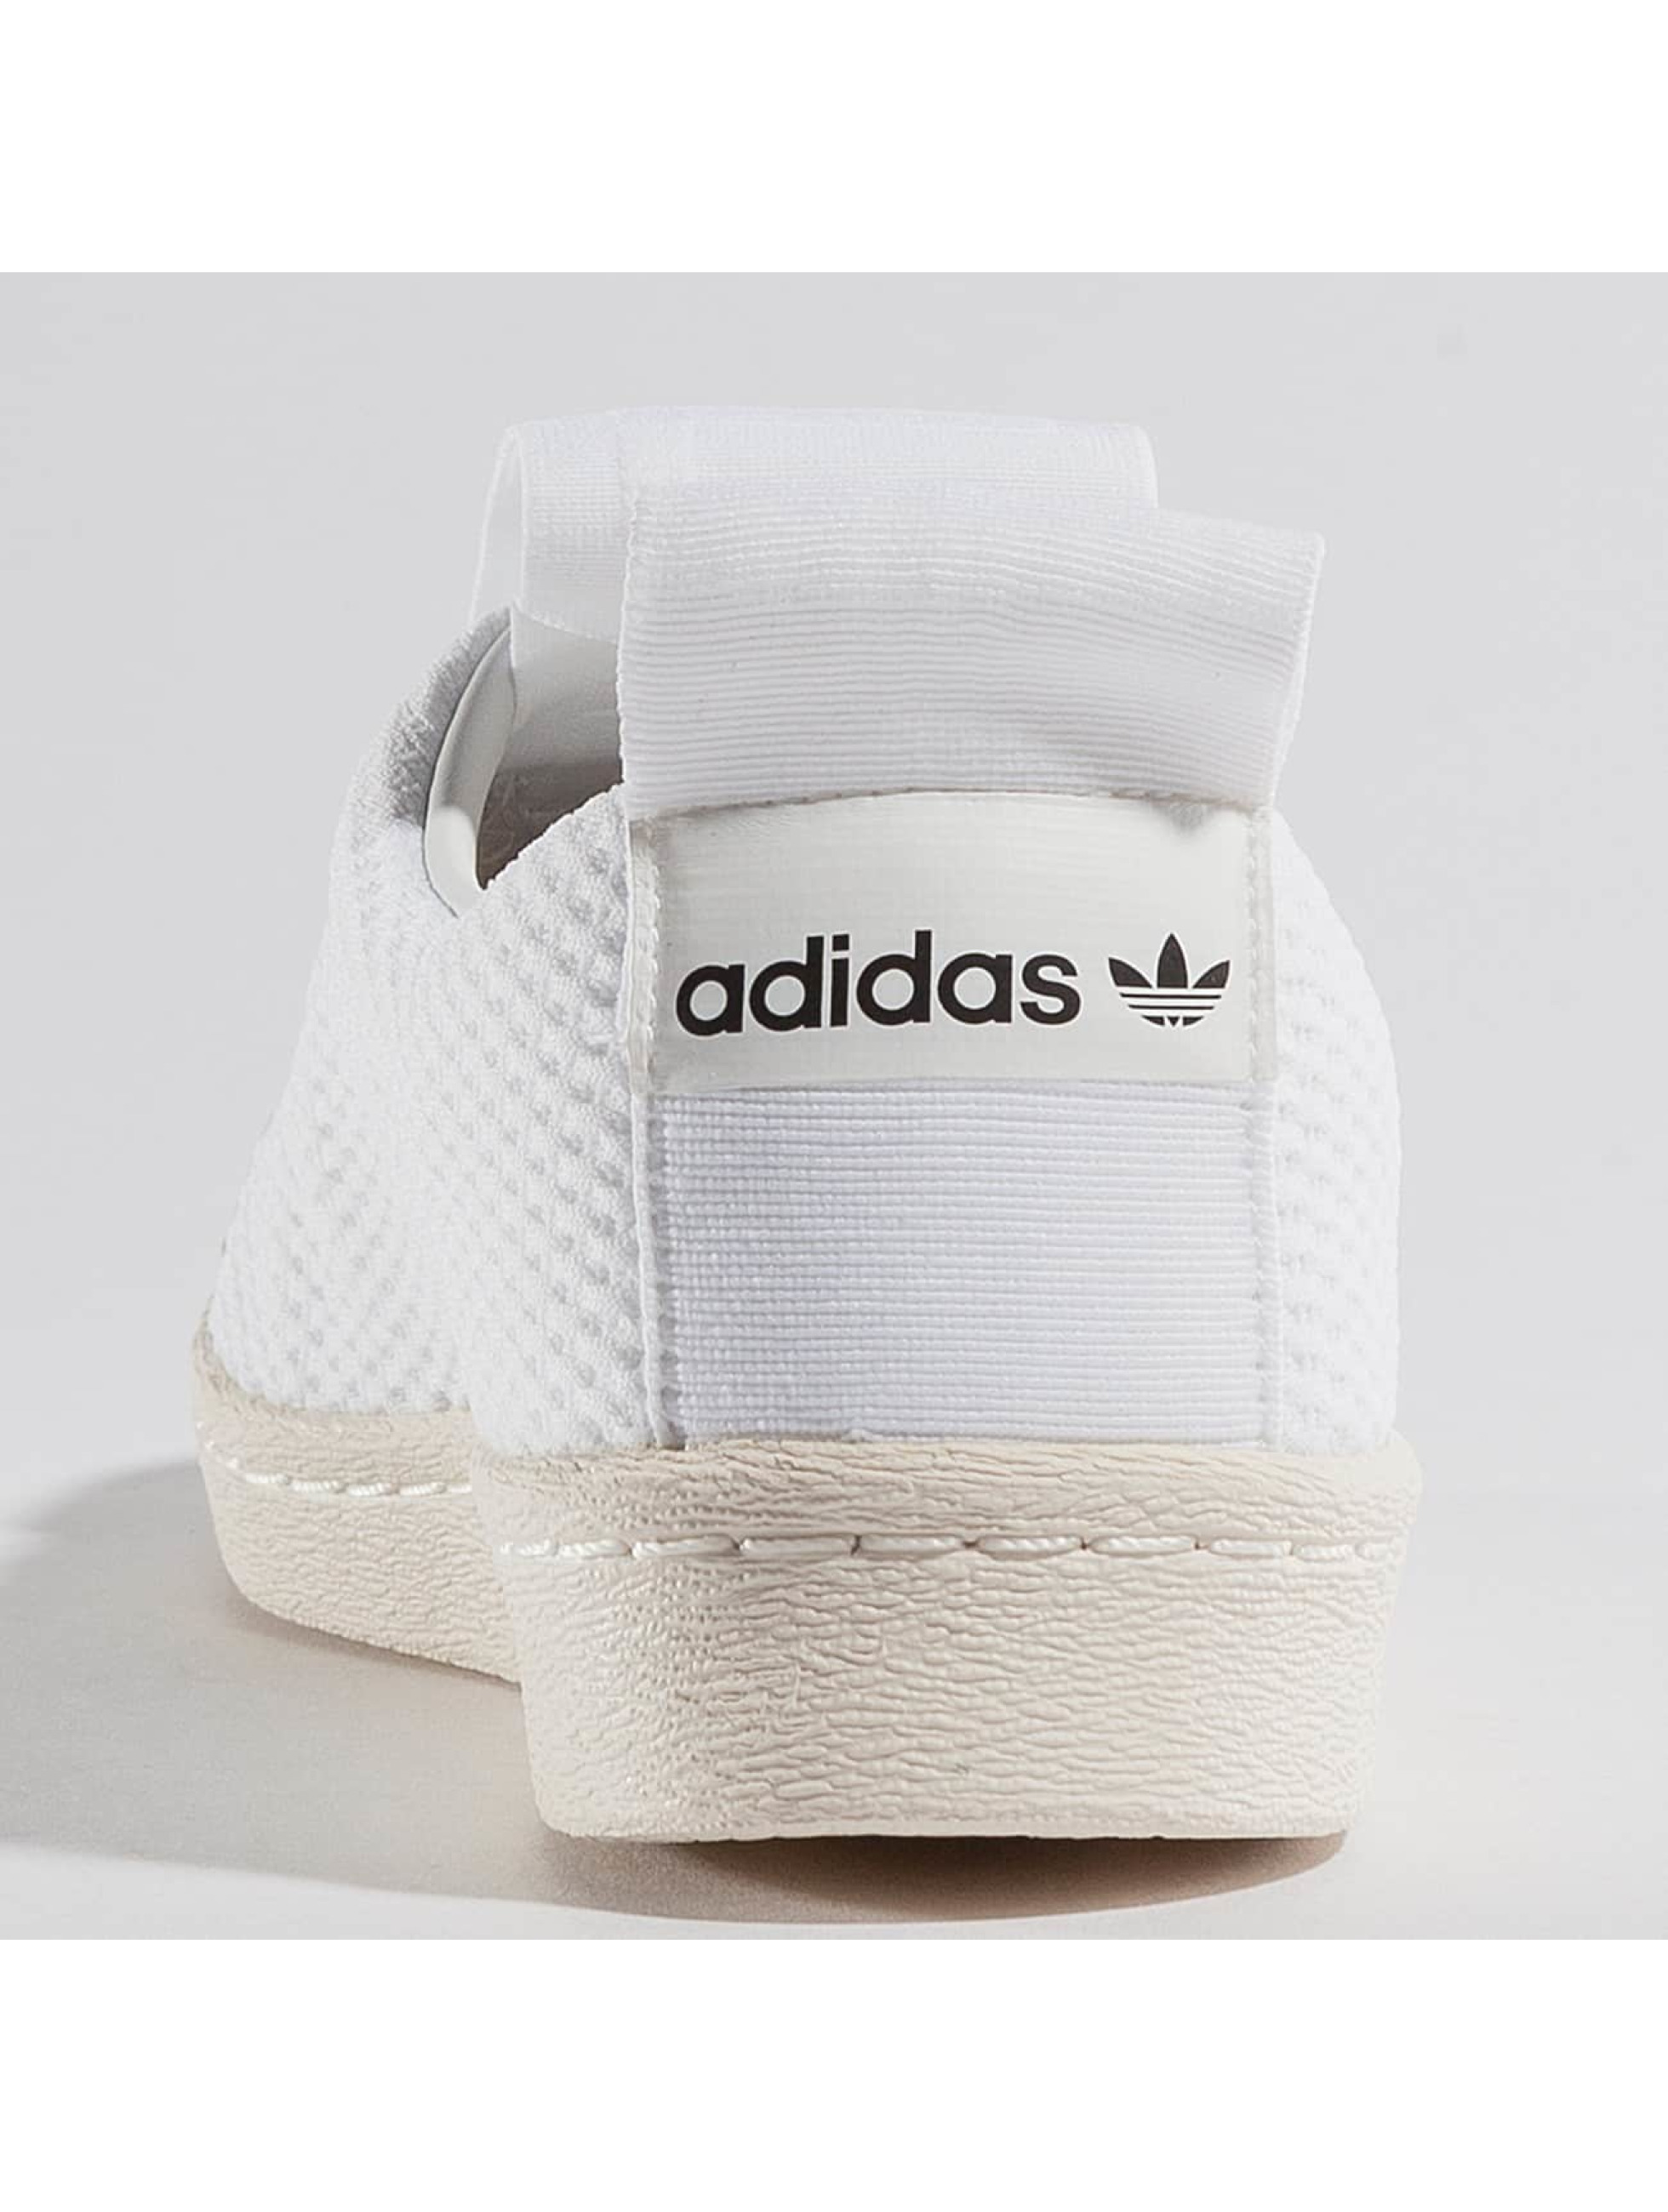 adidas Baskets Superstar BW35 S blanc